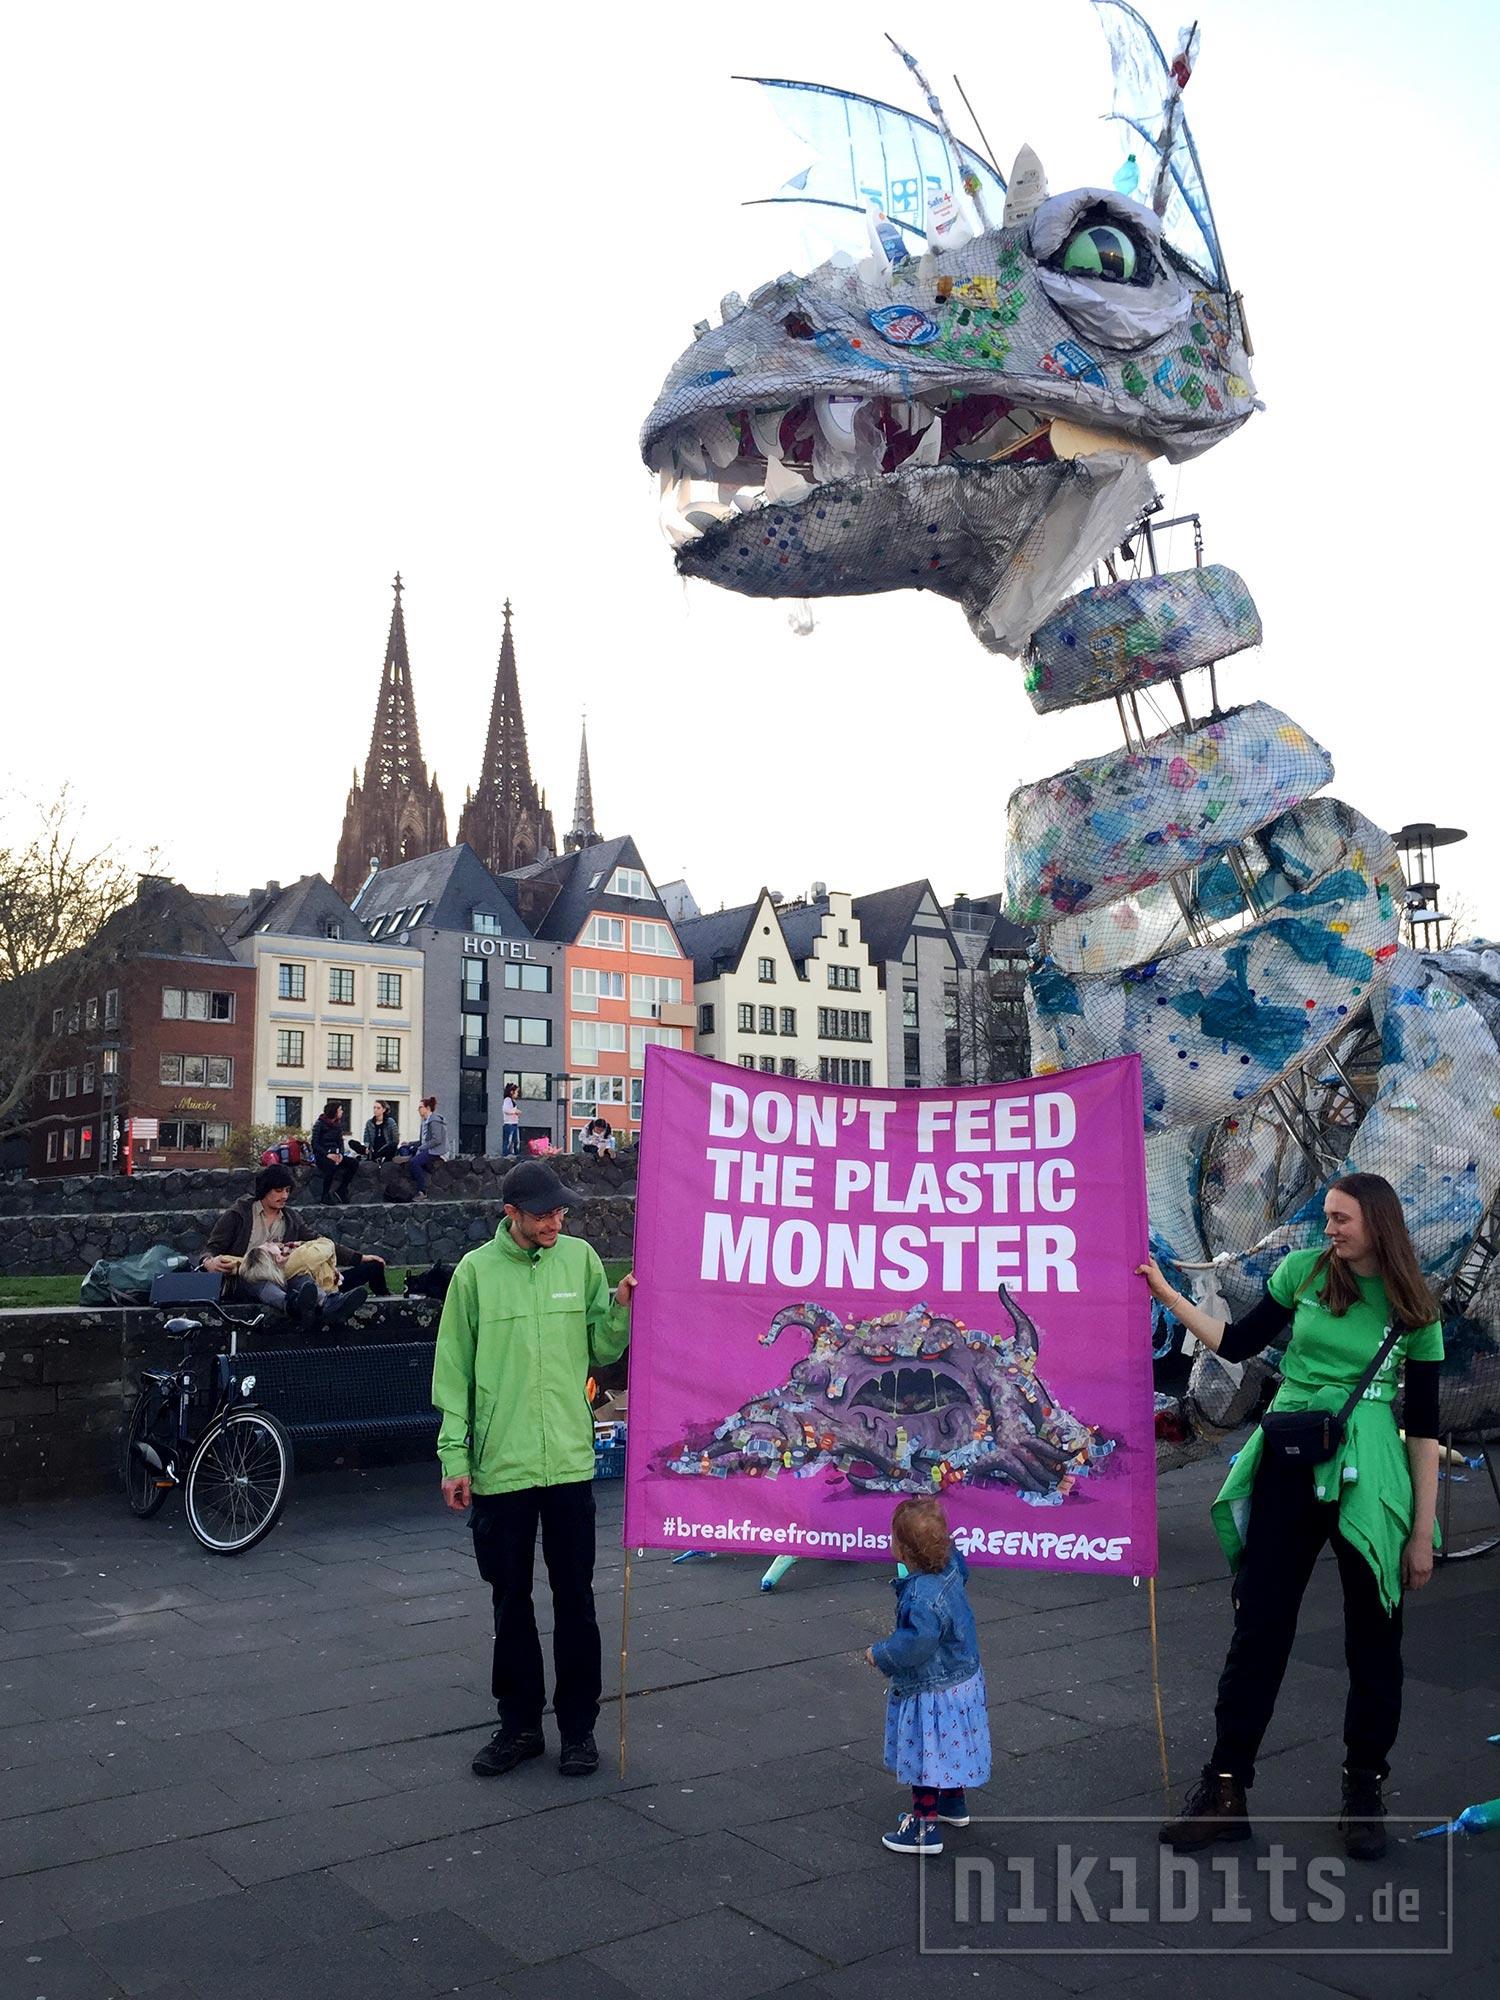 19-03-30_GreenpeaceBeluga_NK_708